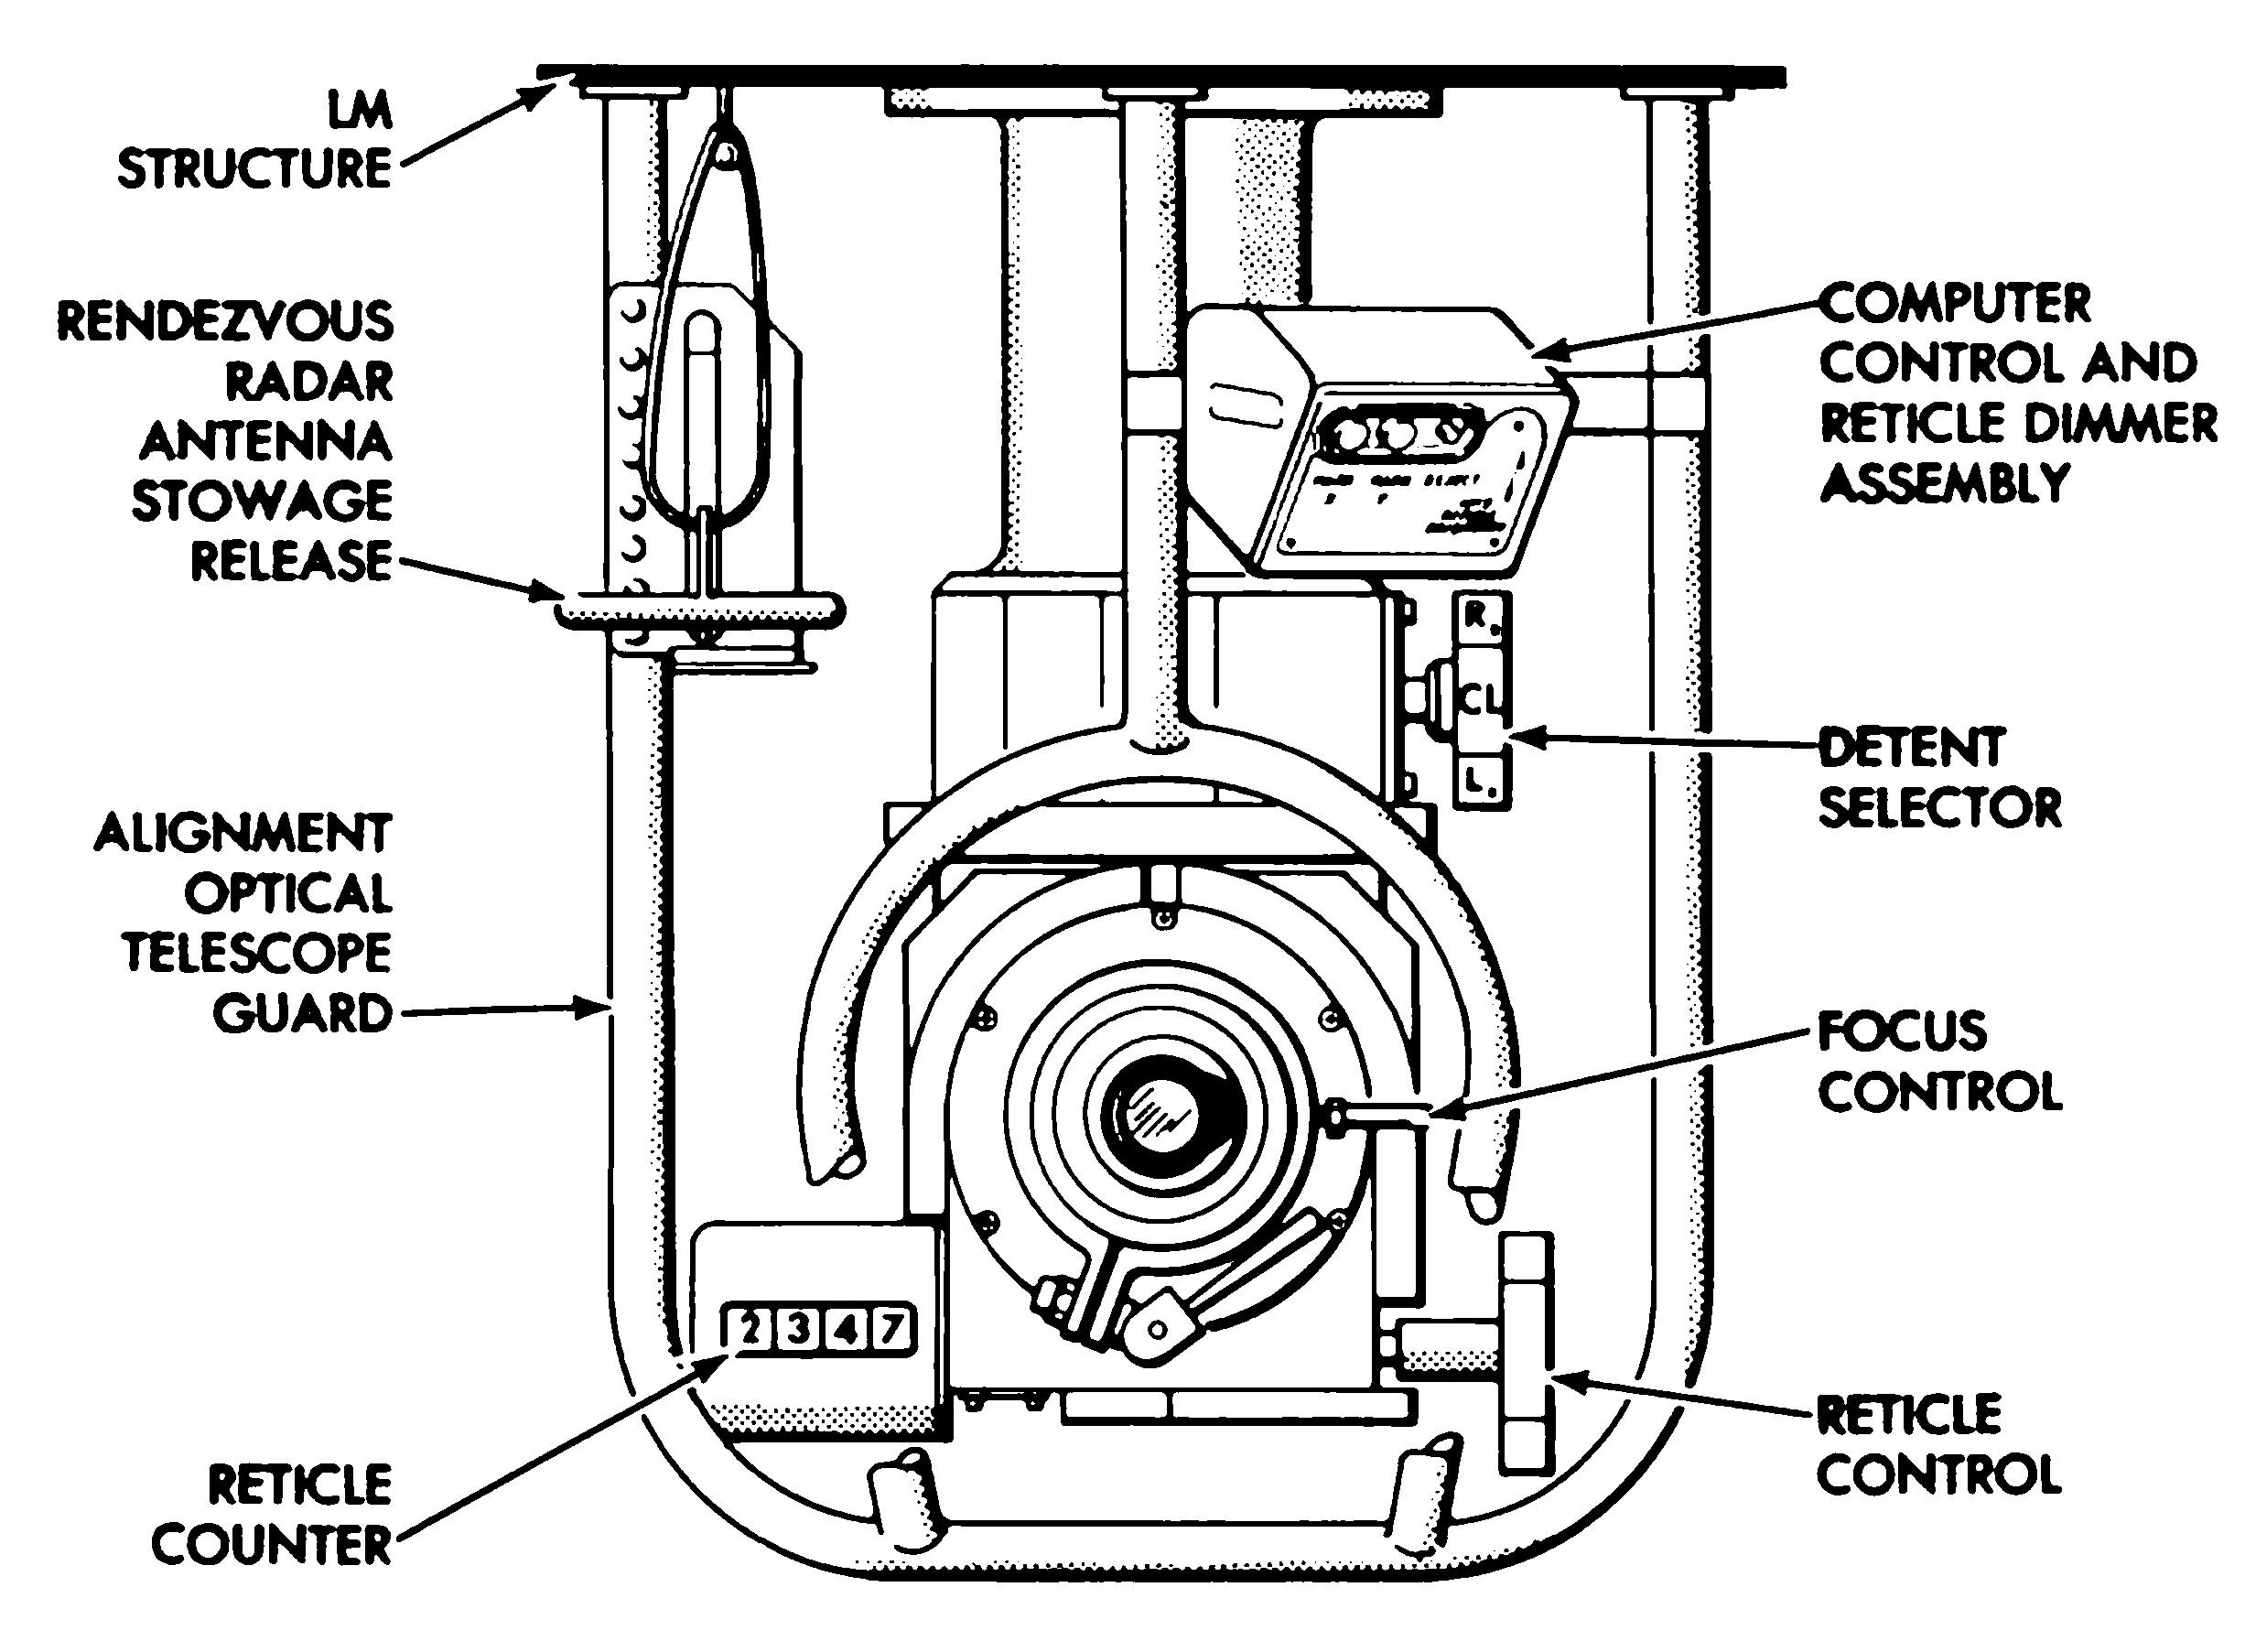 Diagram of the astronaut end of Apollo's AOT, Alignment Optical Telescope